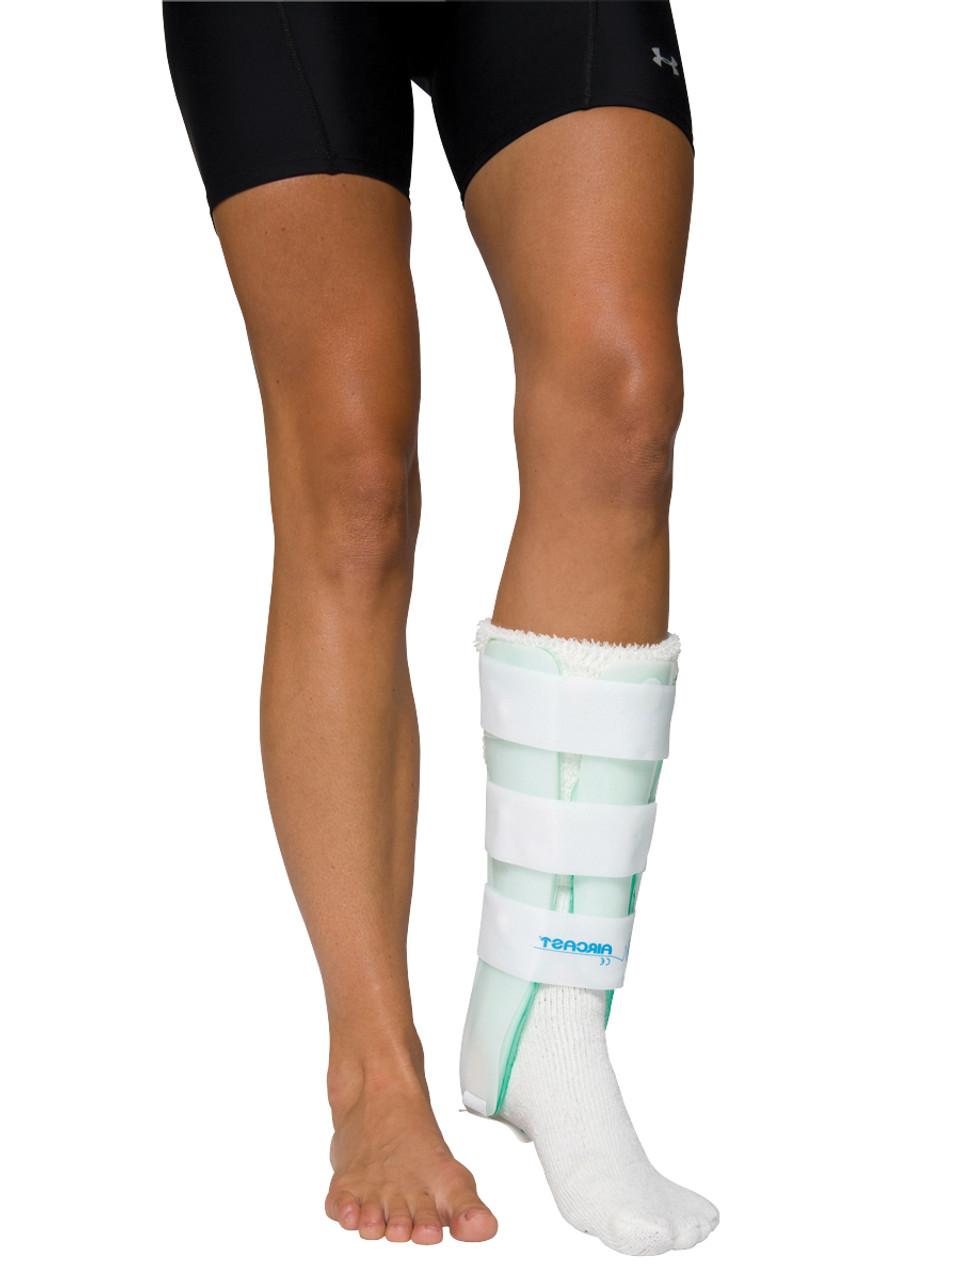 Air Stirrup¨ Leg Brace with Anterior Panel, medium, right